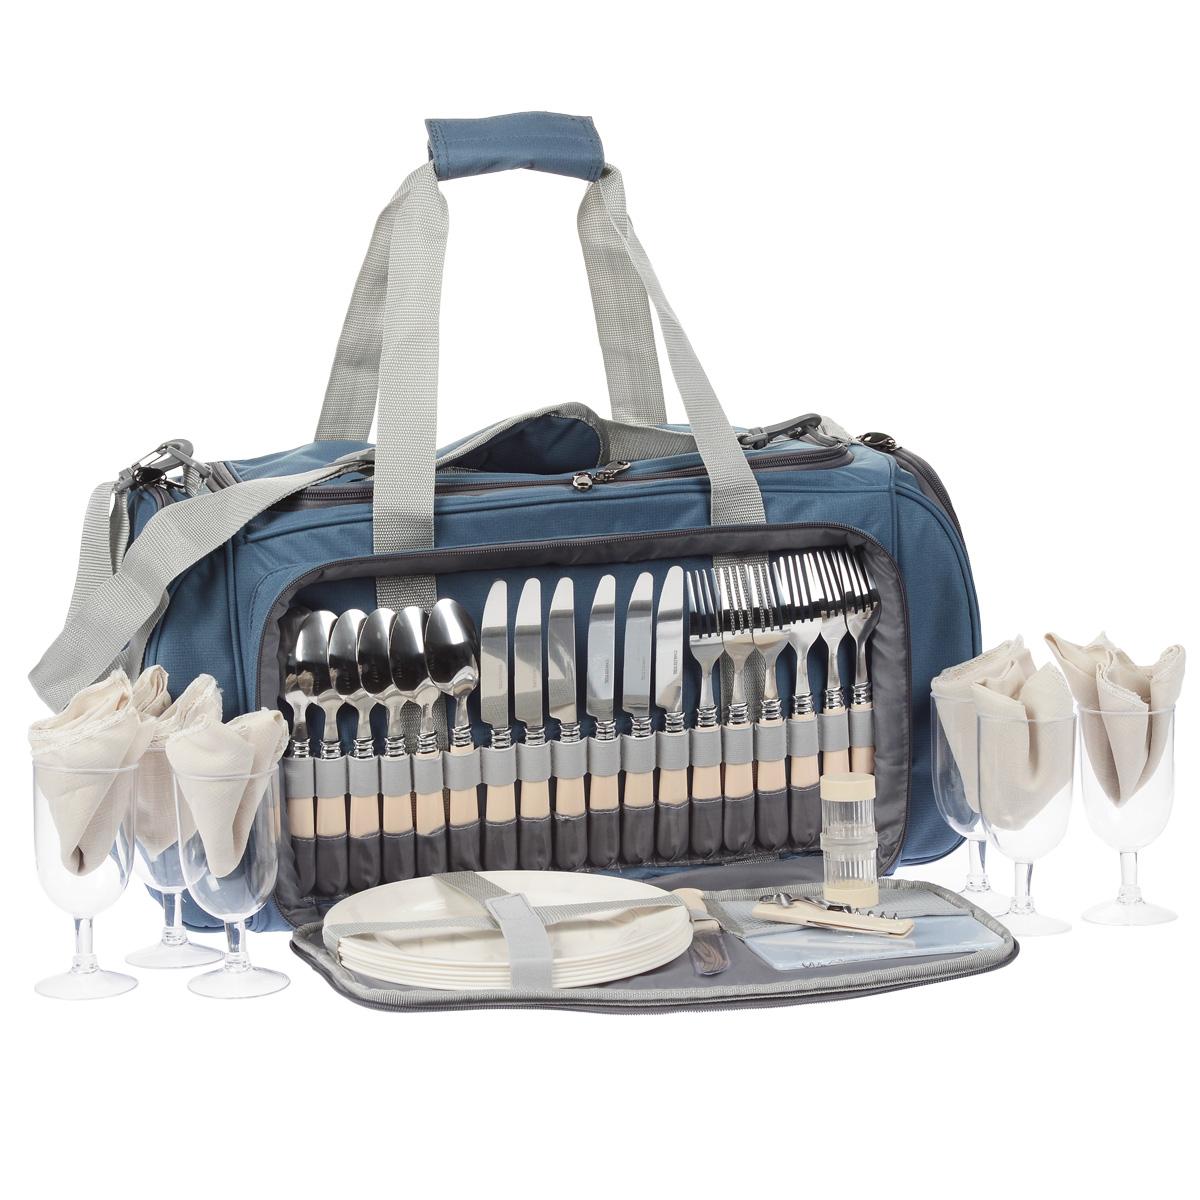 Термосумка Norfin Forssa, с посудой, цвет: голубой, серый, 57 см х 30 см х 29 см статуэтка кролик 30 х 20 х 29 см